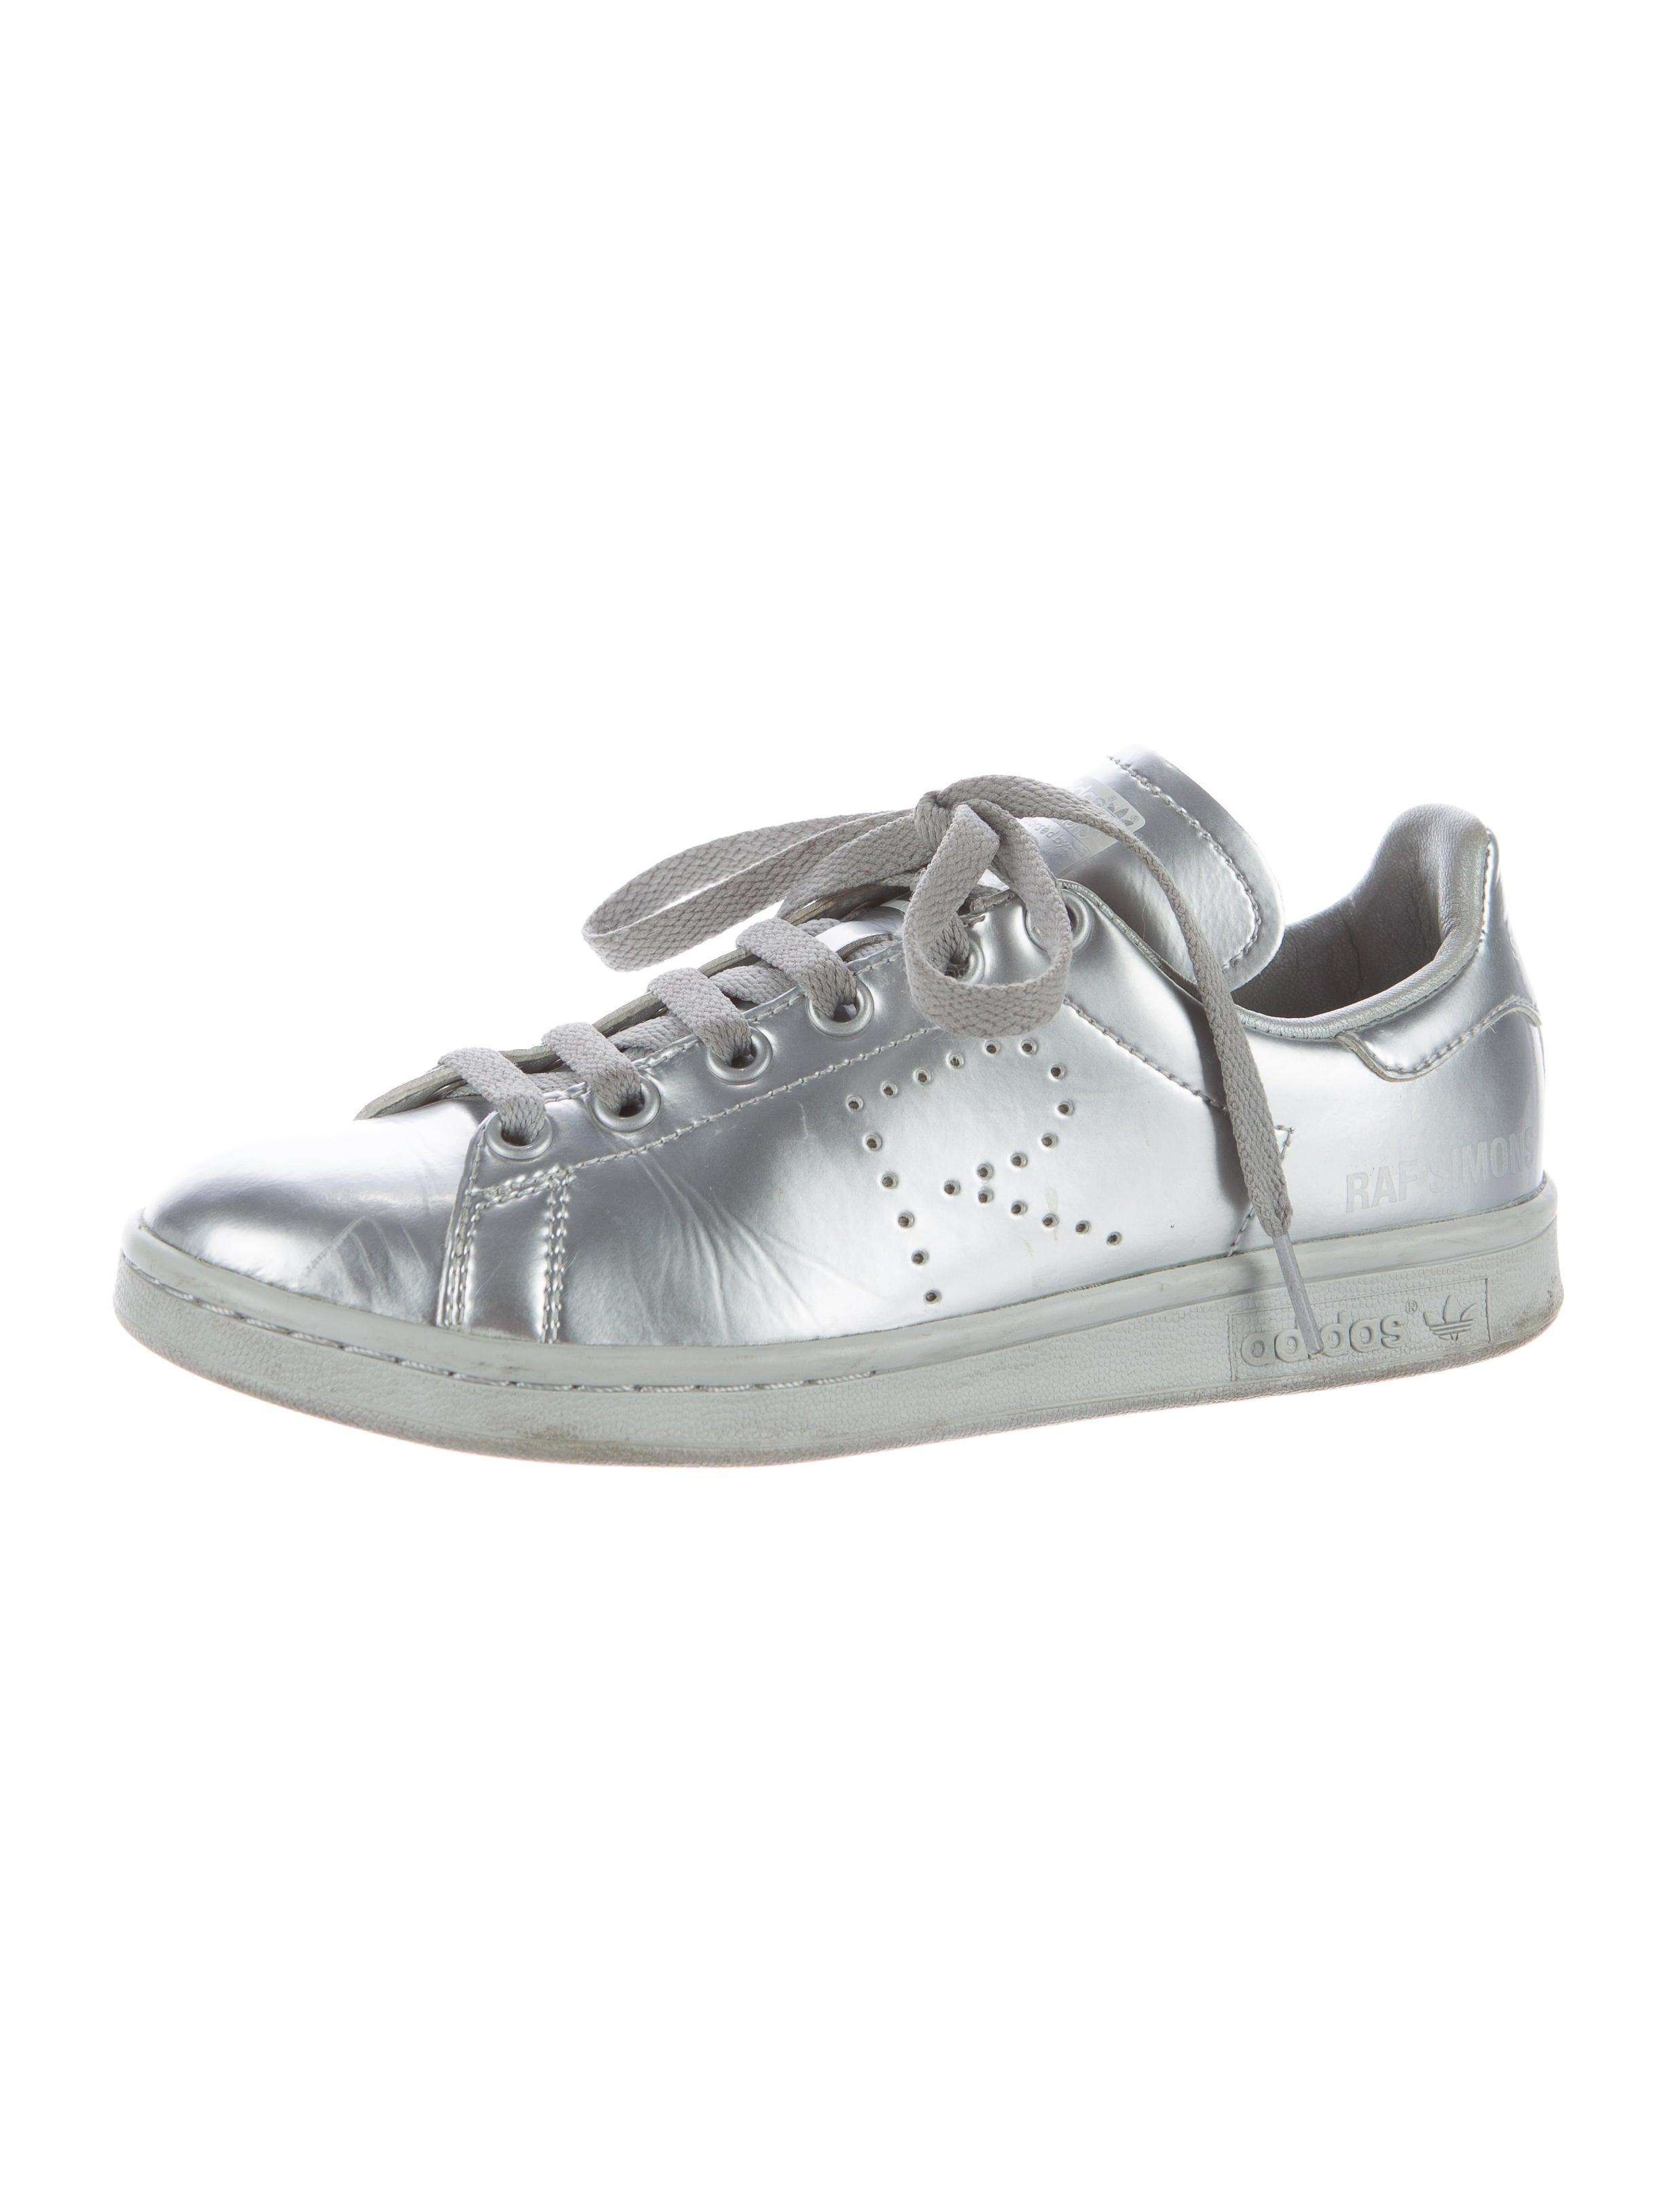 48a0777c1b51 Raf Simons x Adidas 2016 Stan Smith Sneakers - Shoes .